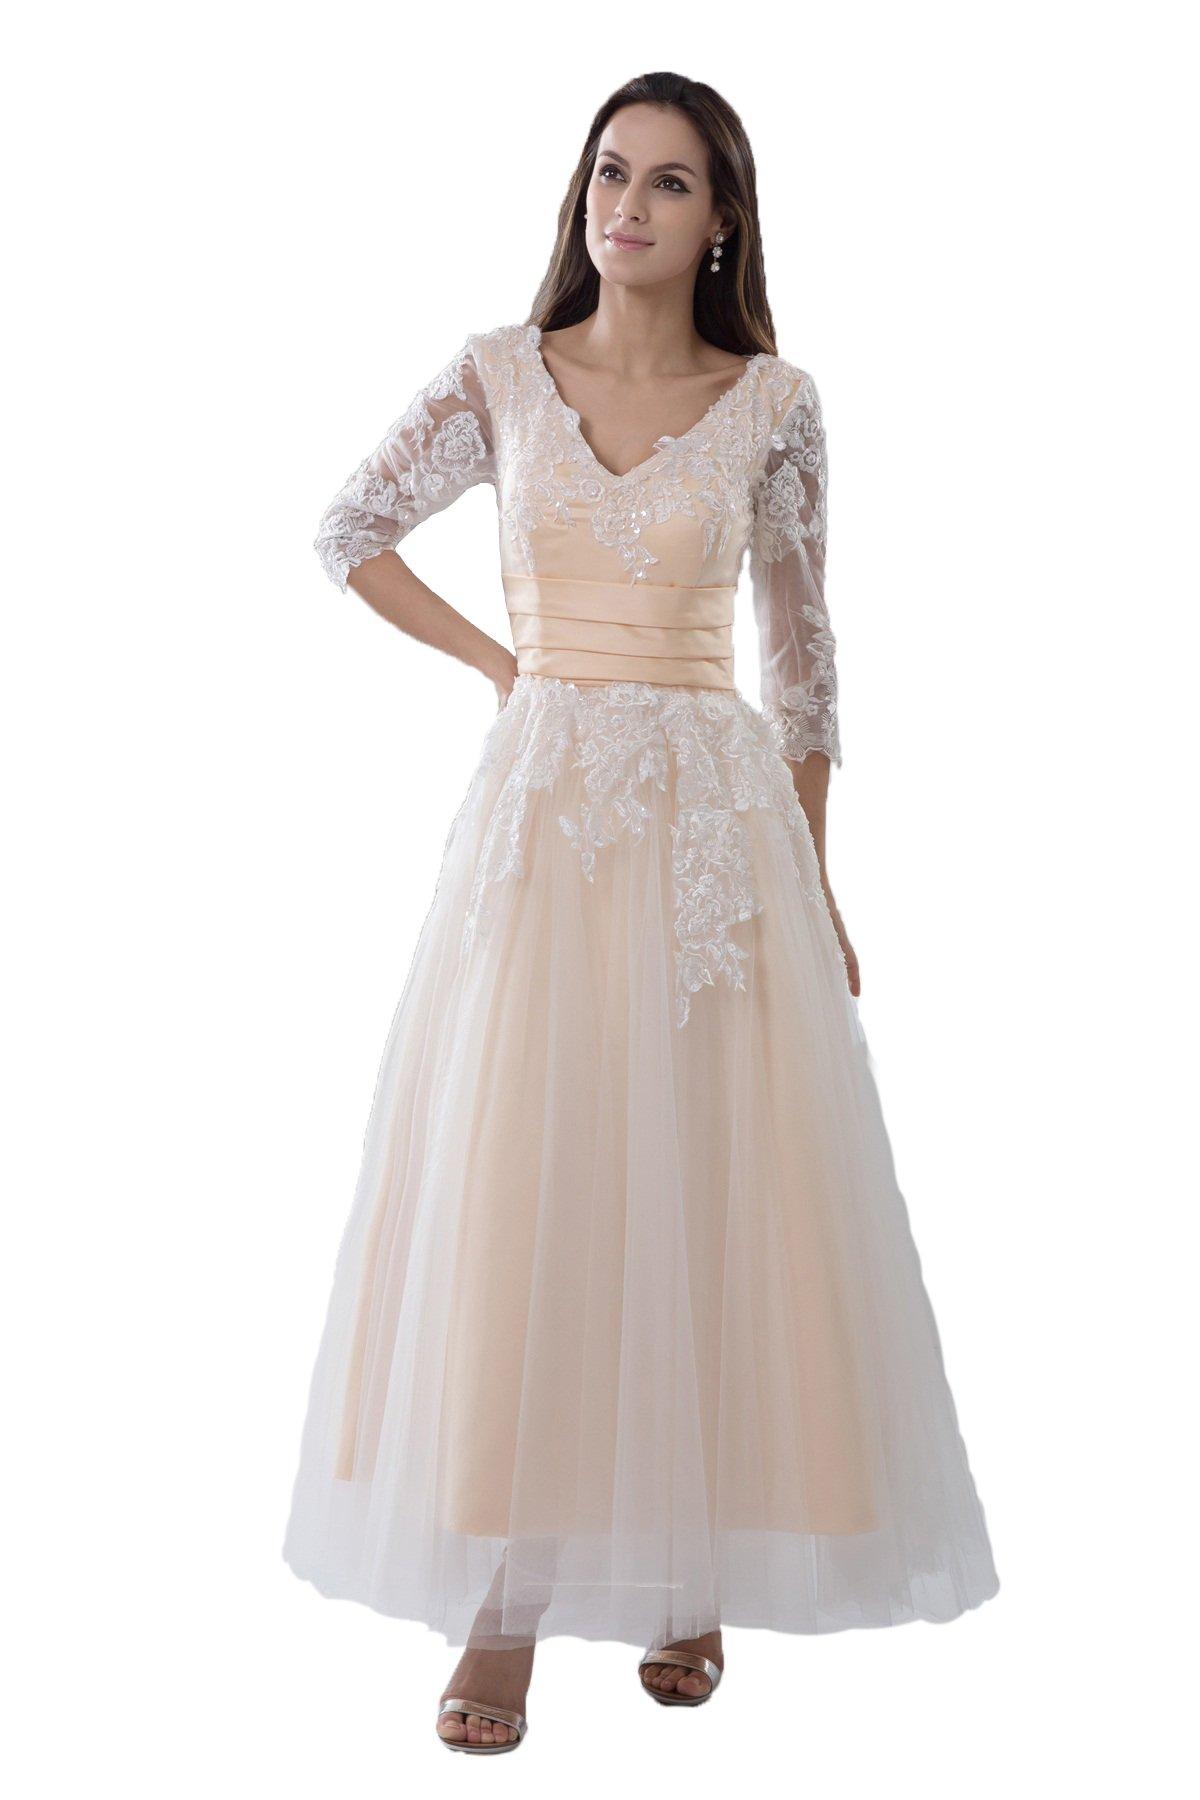 Snowskite Women's A-line V-neck Ankle Length Beach Wedding Bridal Gowns White&Champagne 20